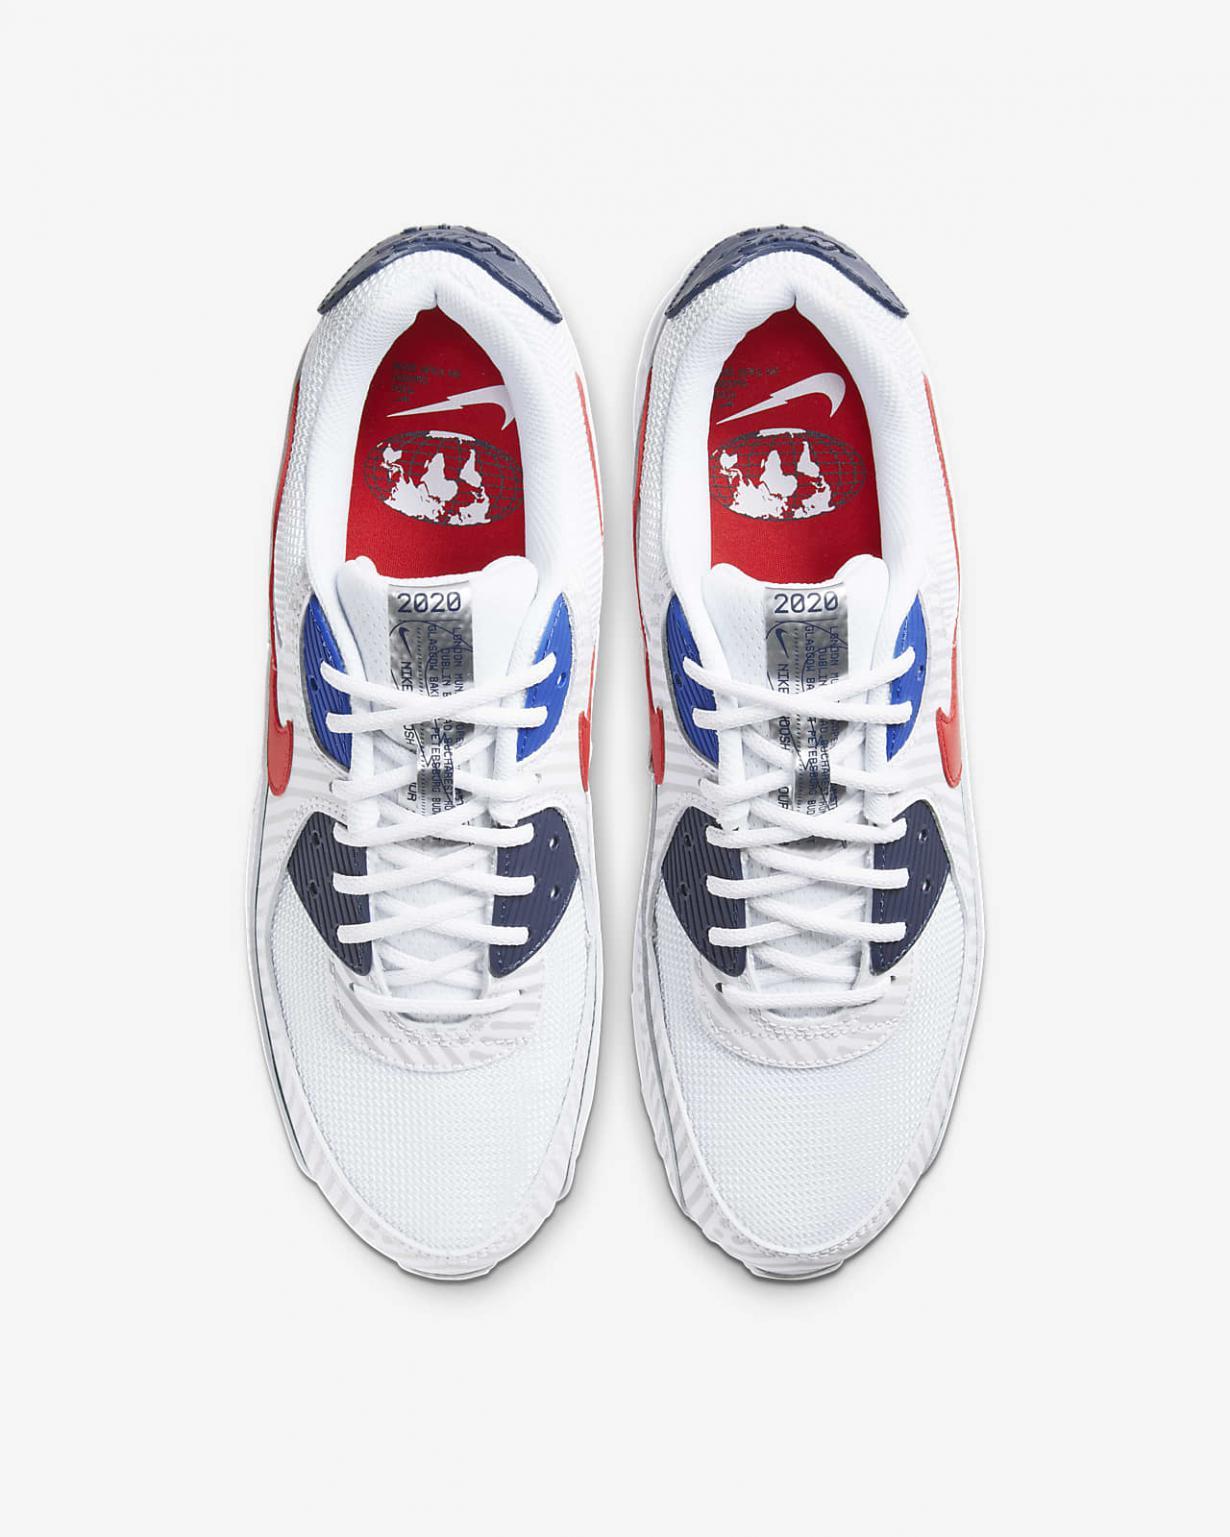 Lifestyle Homme | Air Max 90 Blanc/Bleu nuit marine/Bleu brillant/Rouge université | Nike < Gooddaytricities